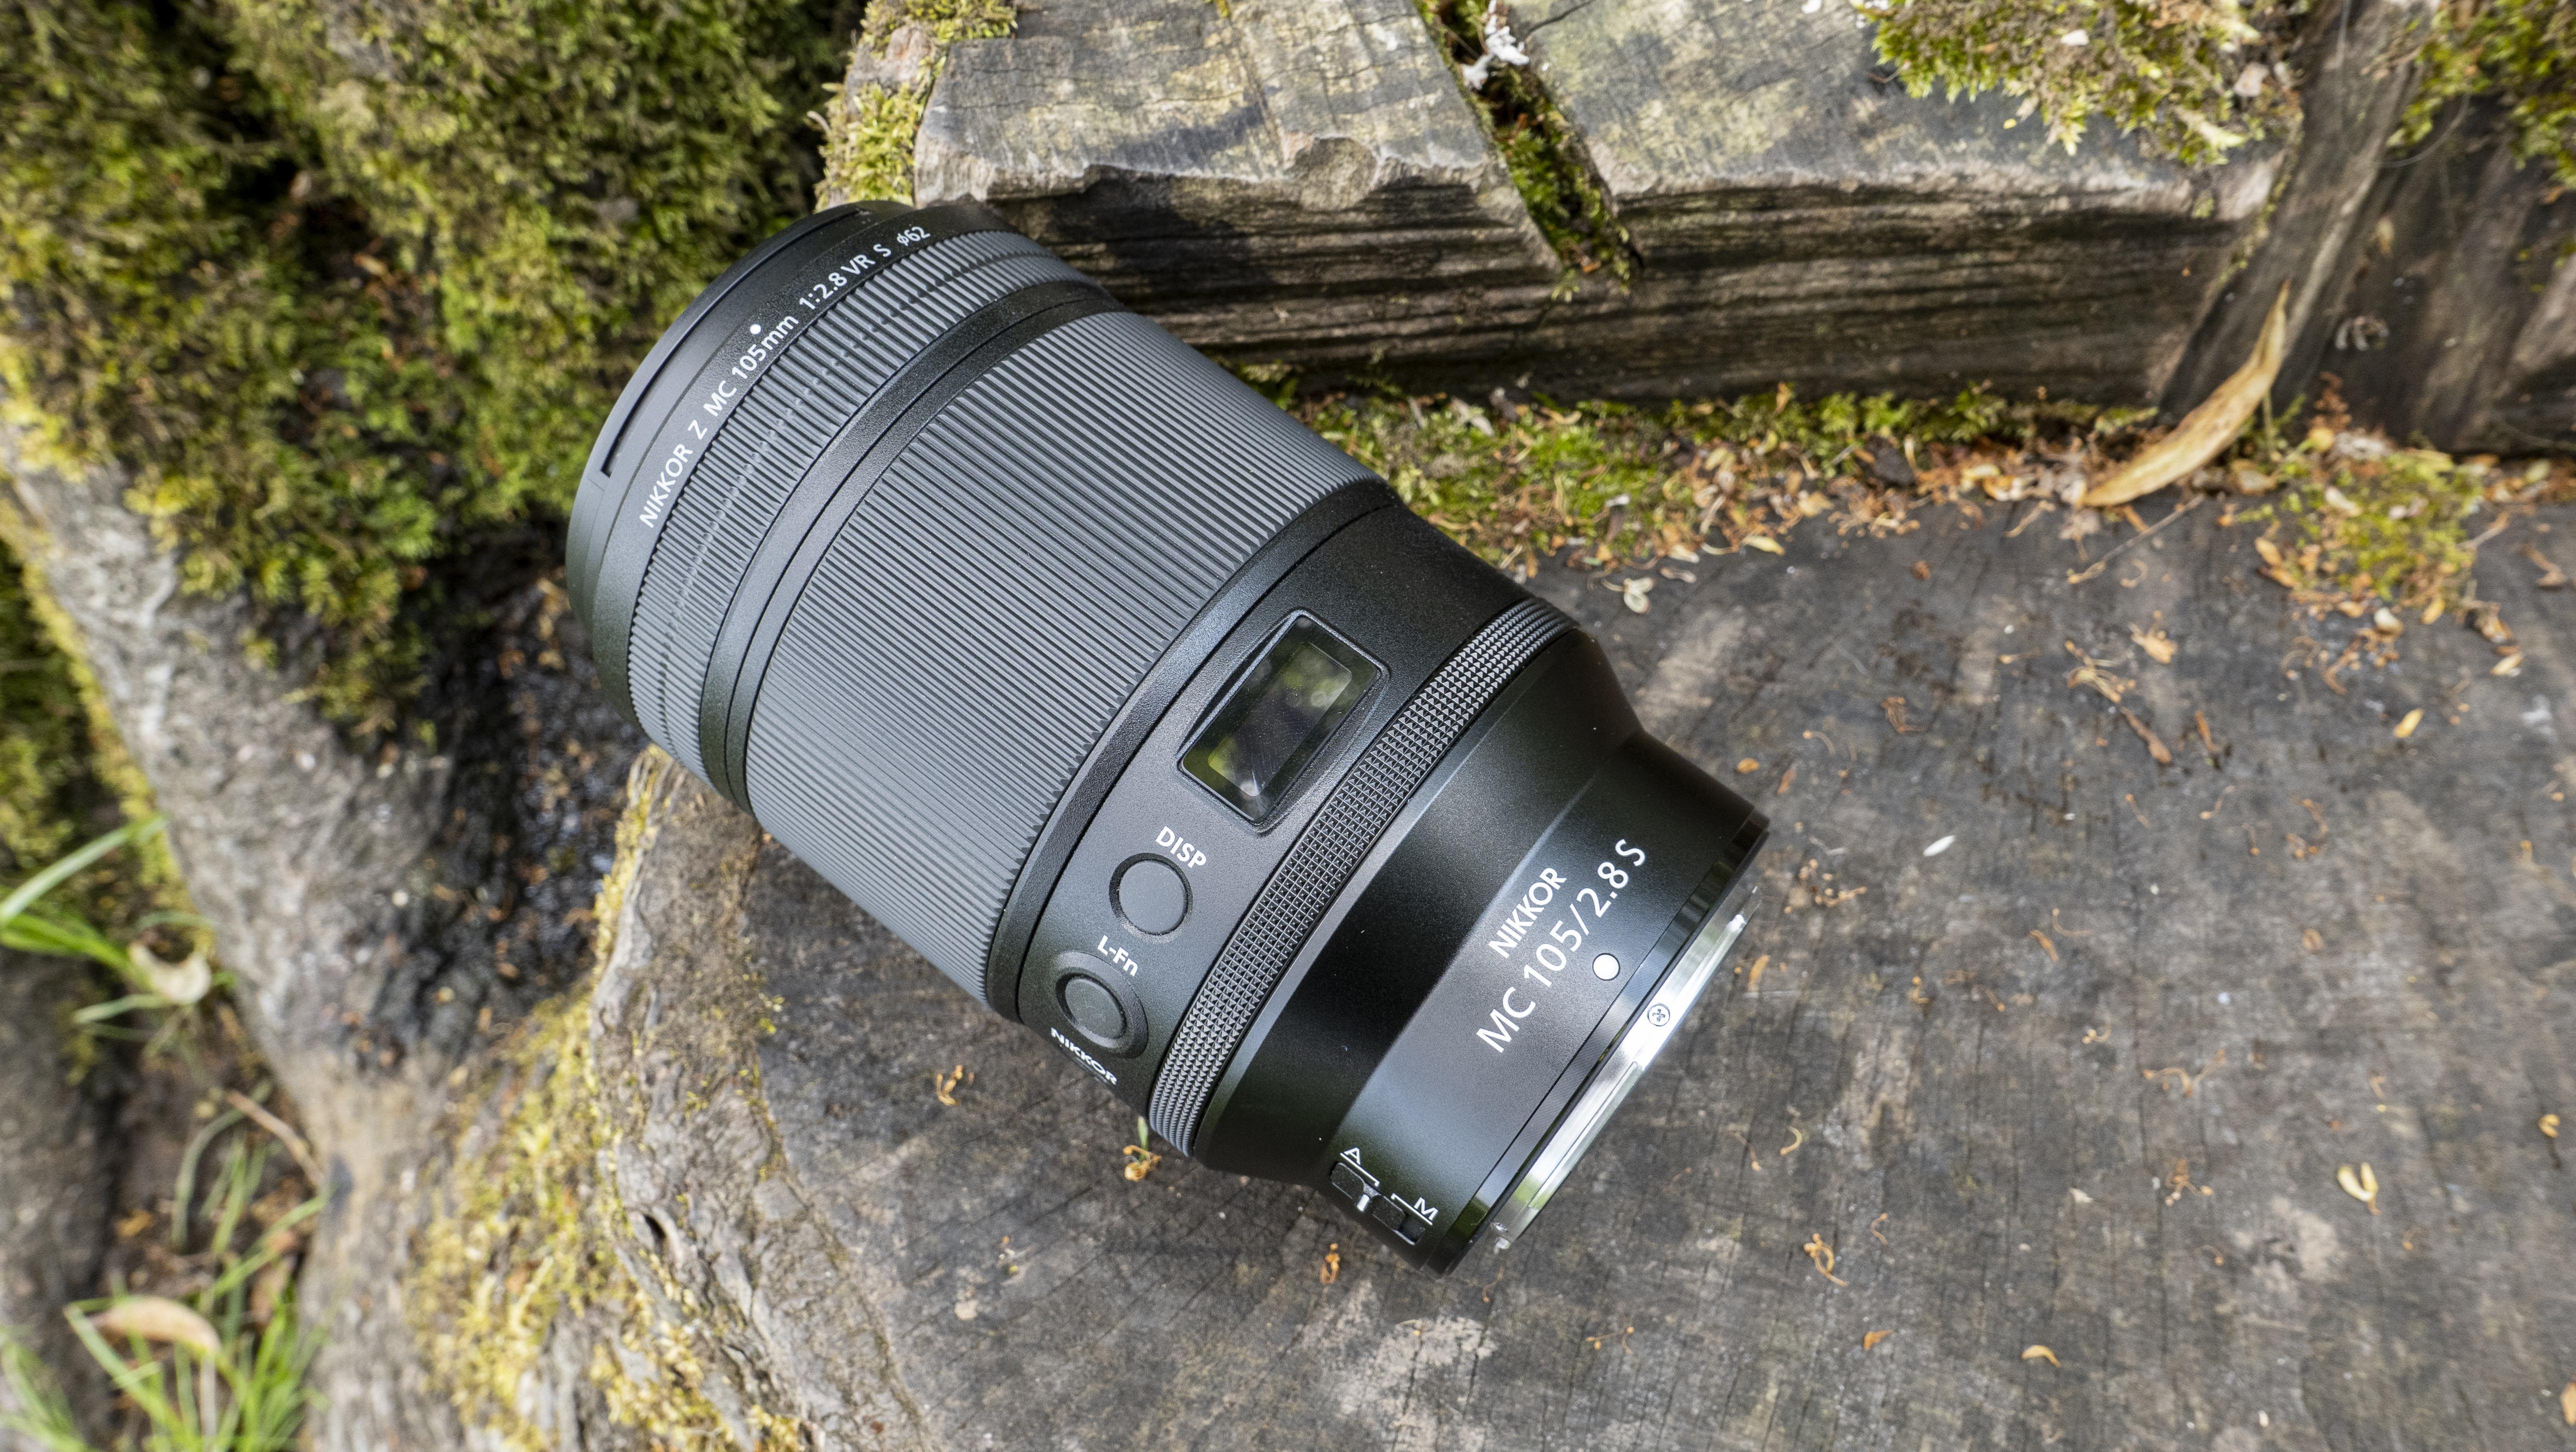 The side of the Nikon Nikkor Z MC 105mm f/2.8 VR S lens